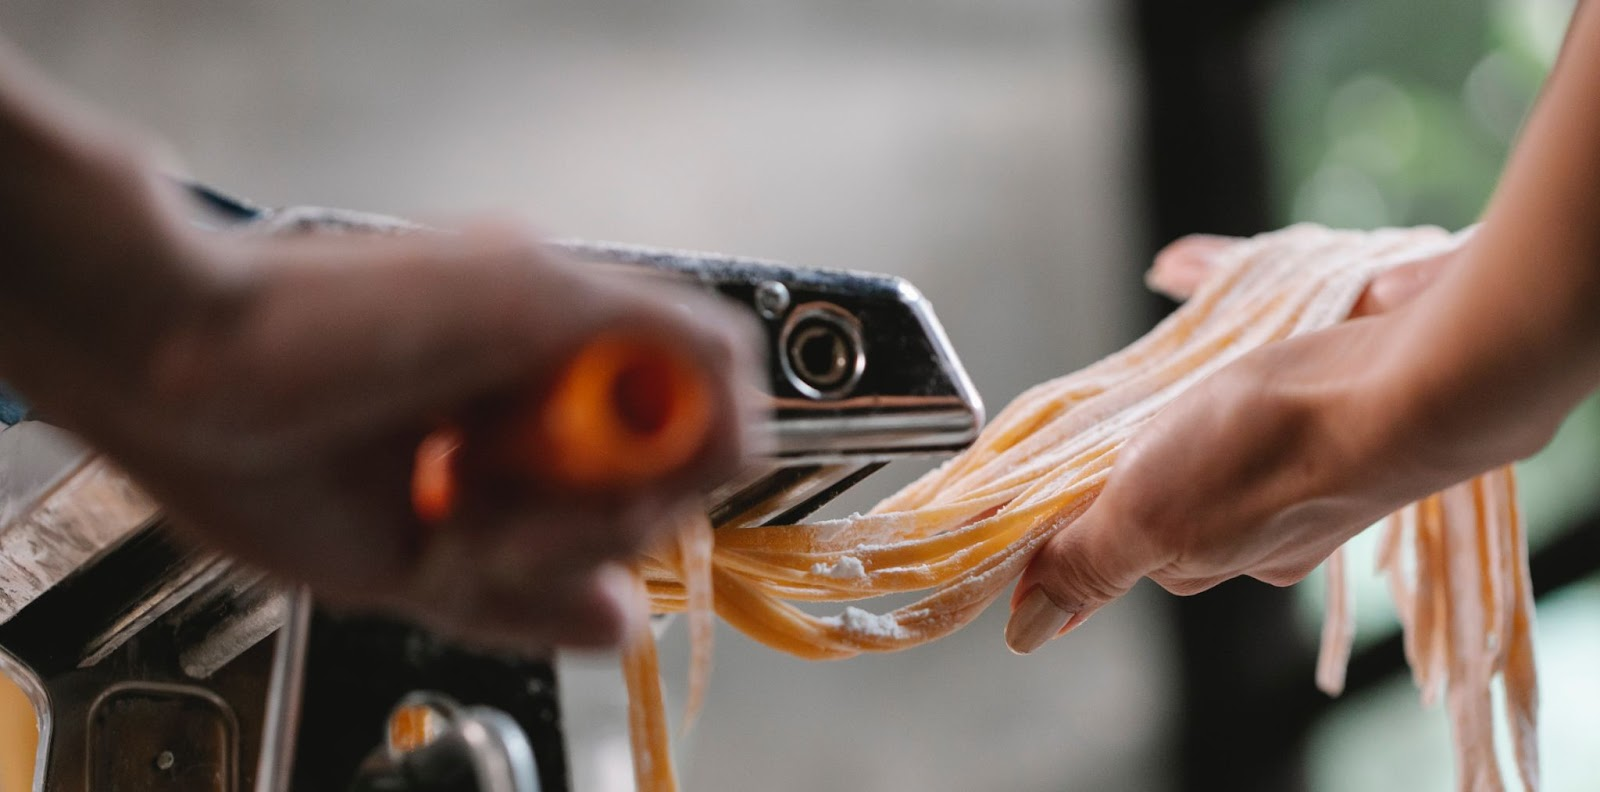 cutting fresh pasta - gluten free pasta - accordingtojo.com